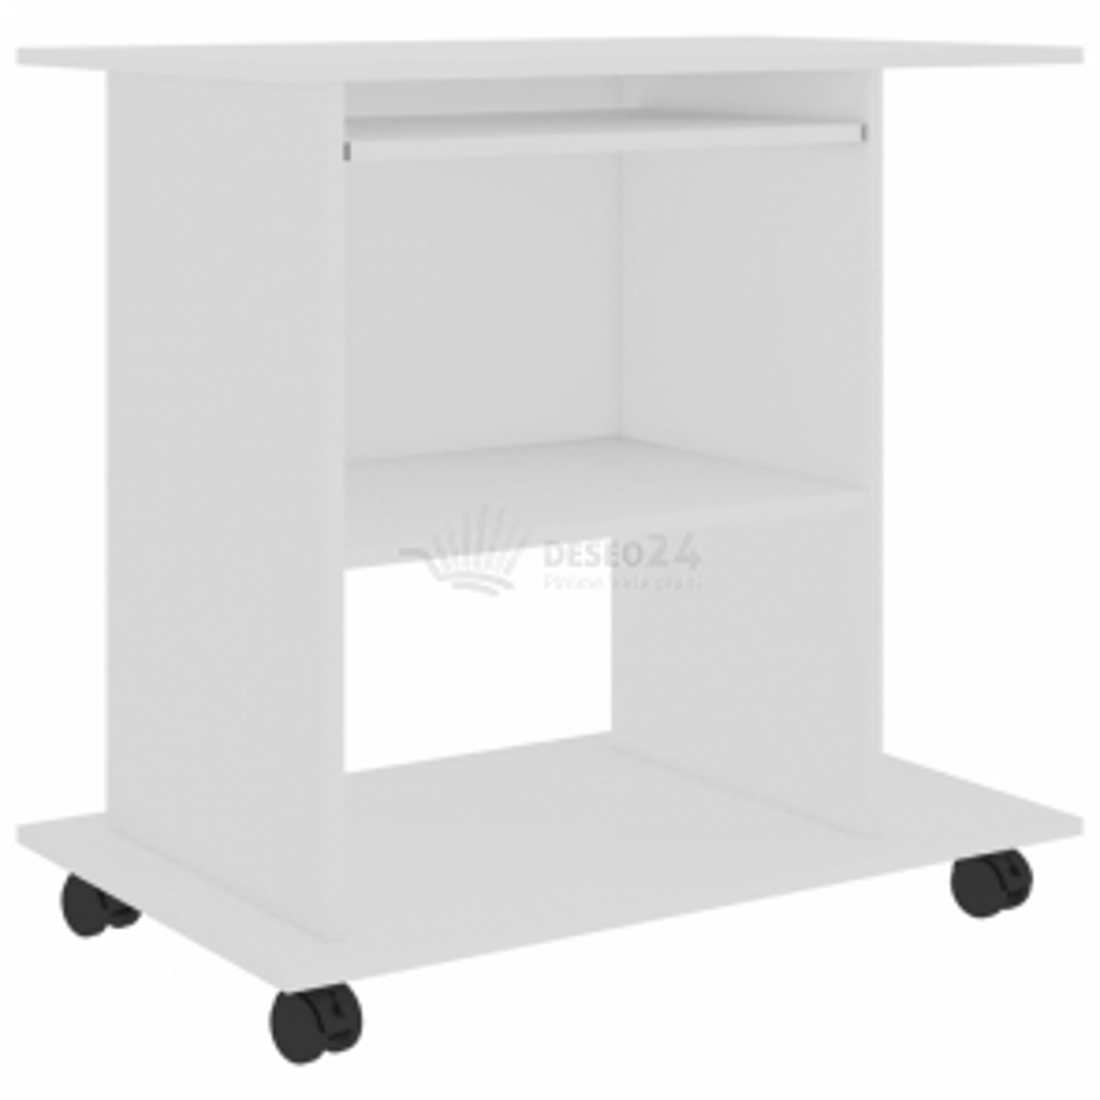 vidaXL Počítačový stůl bílý 80 x 50 x 75 cm dřevotříska [802894]